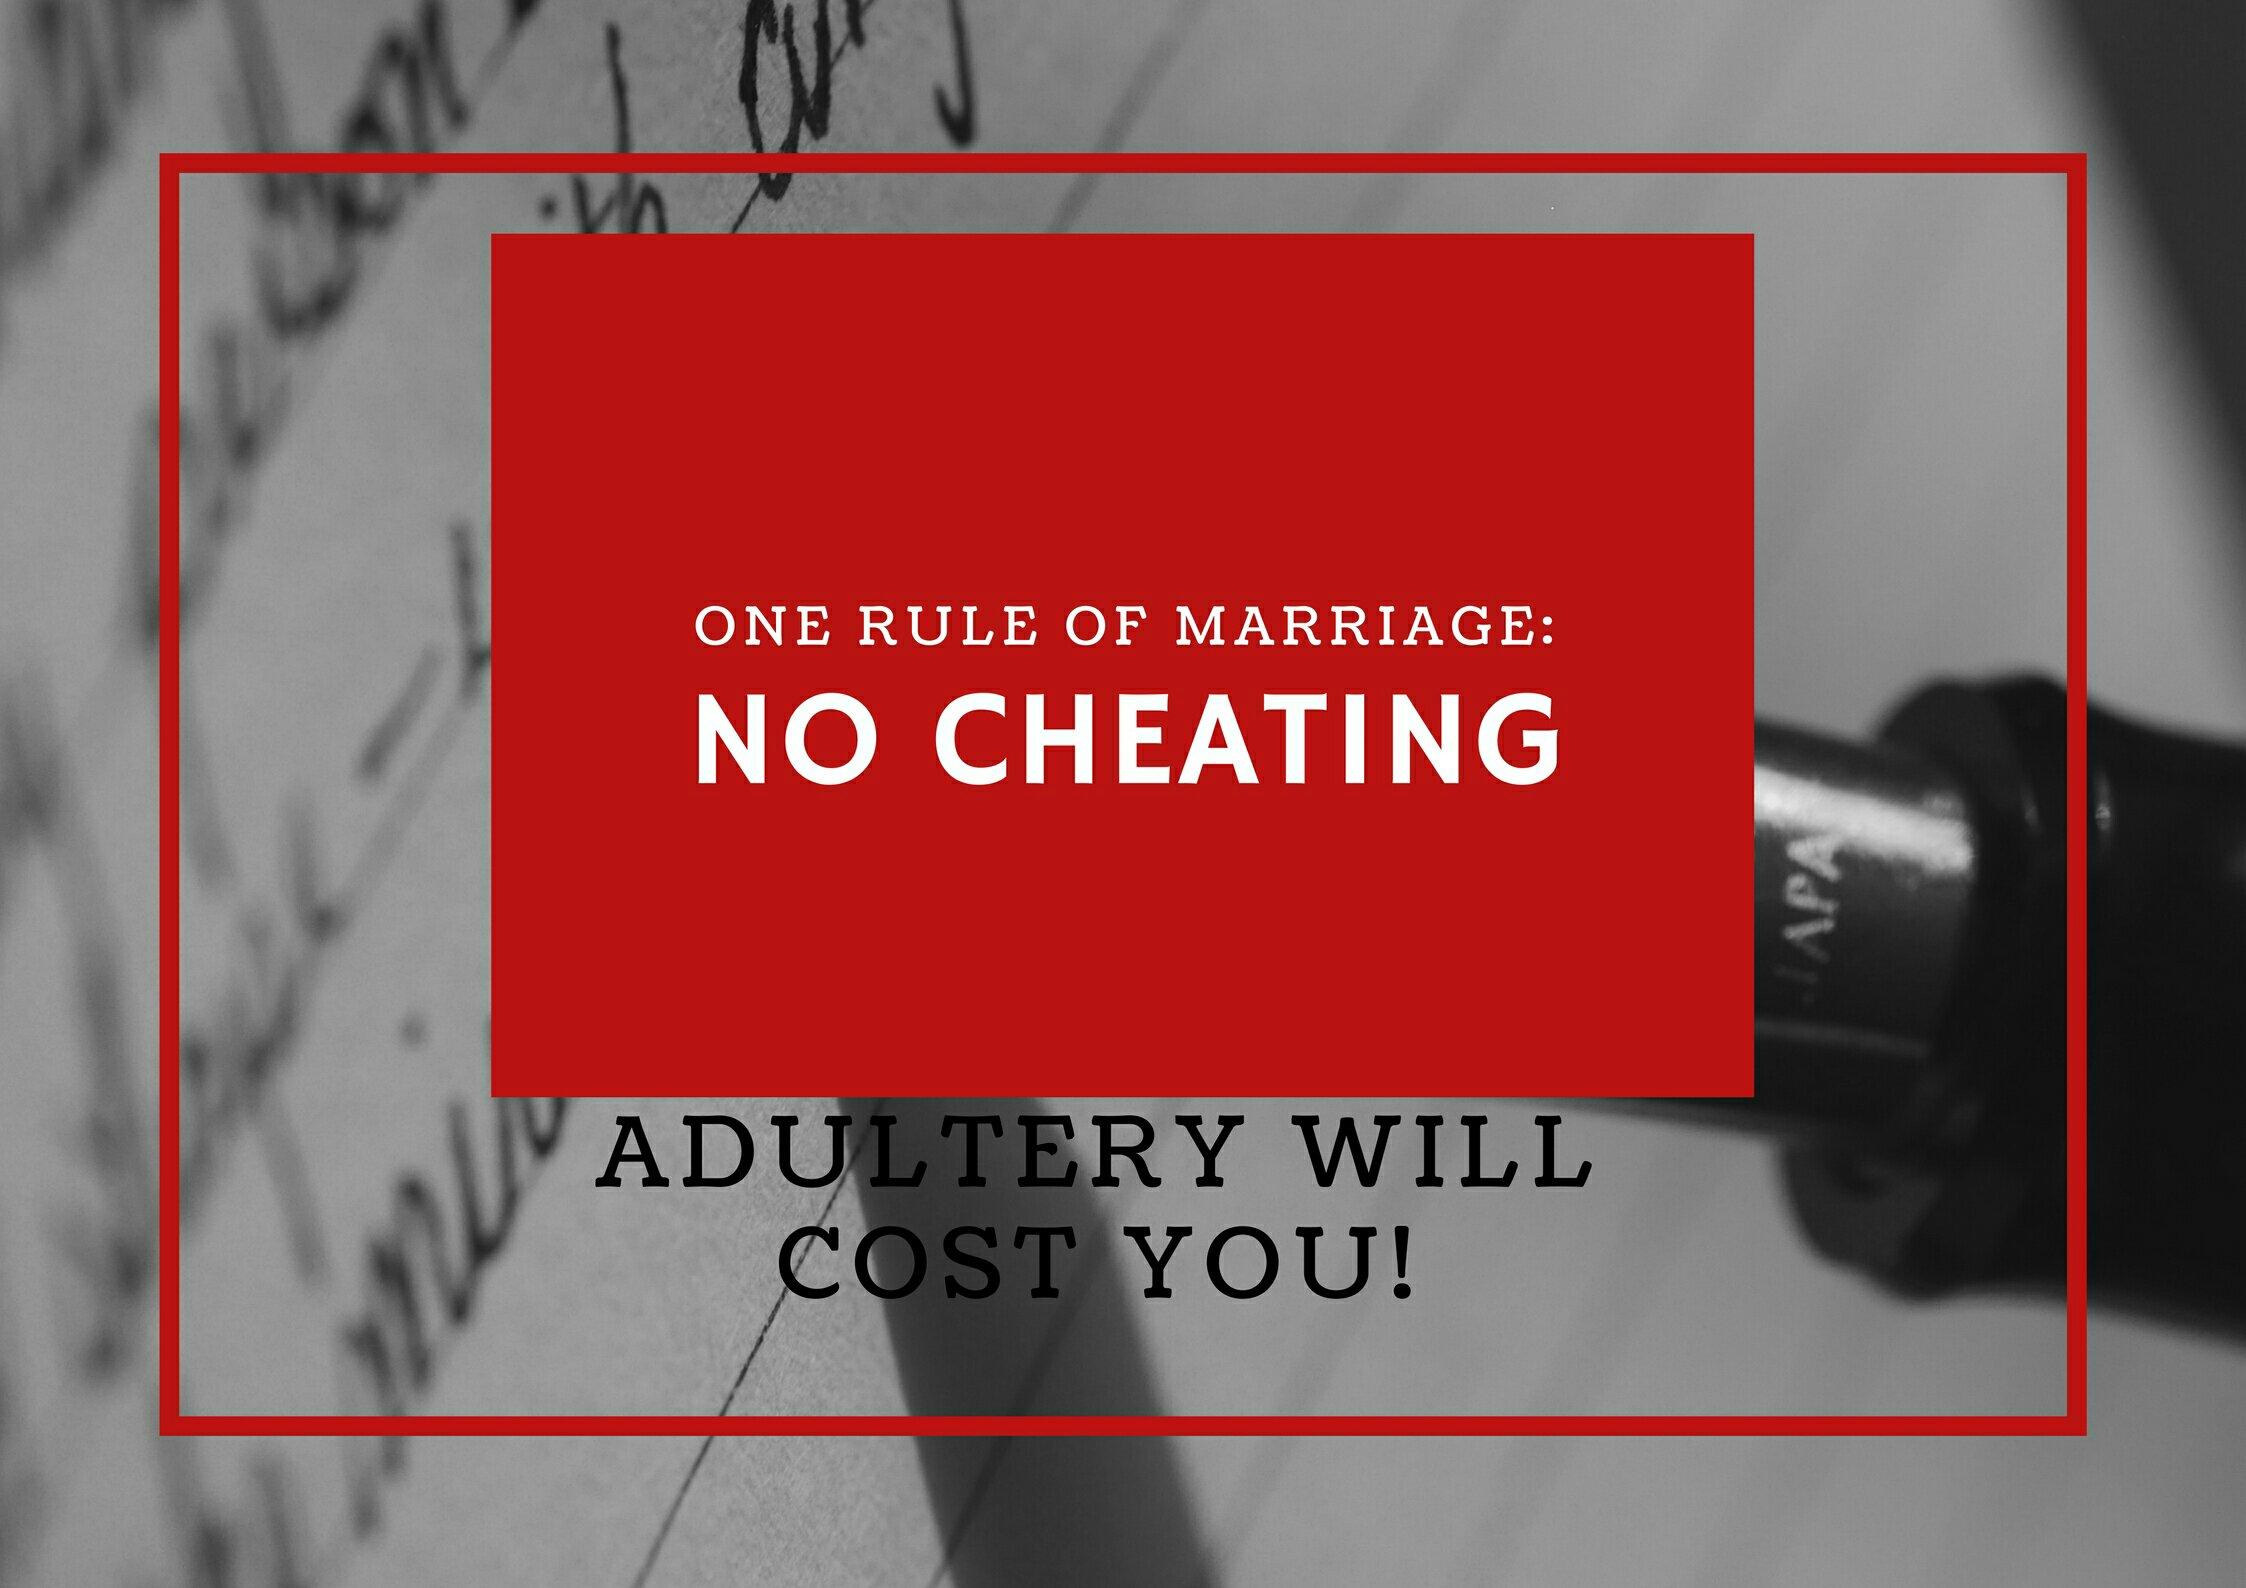 Fidelity in marriage